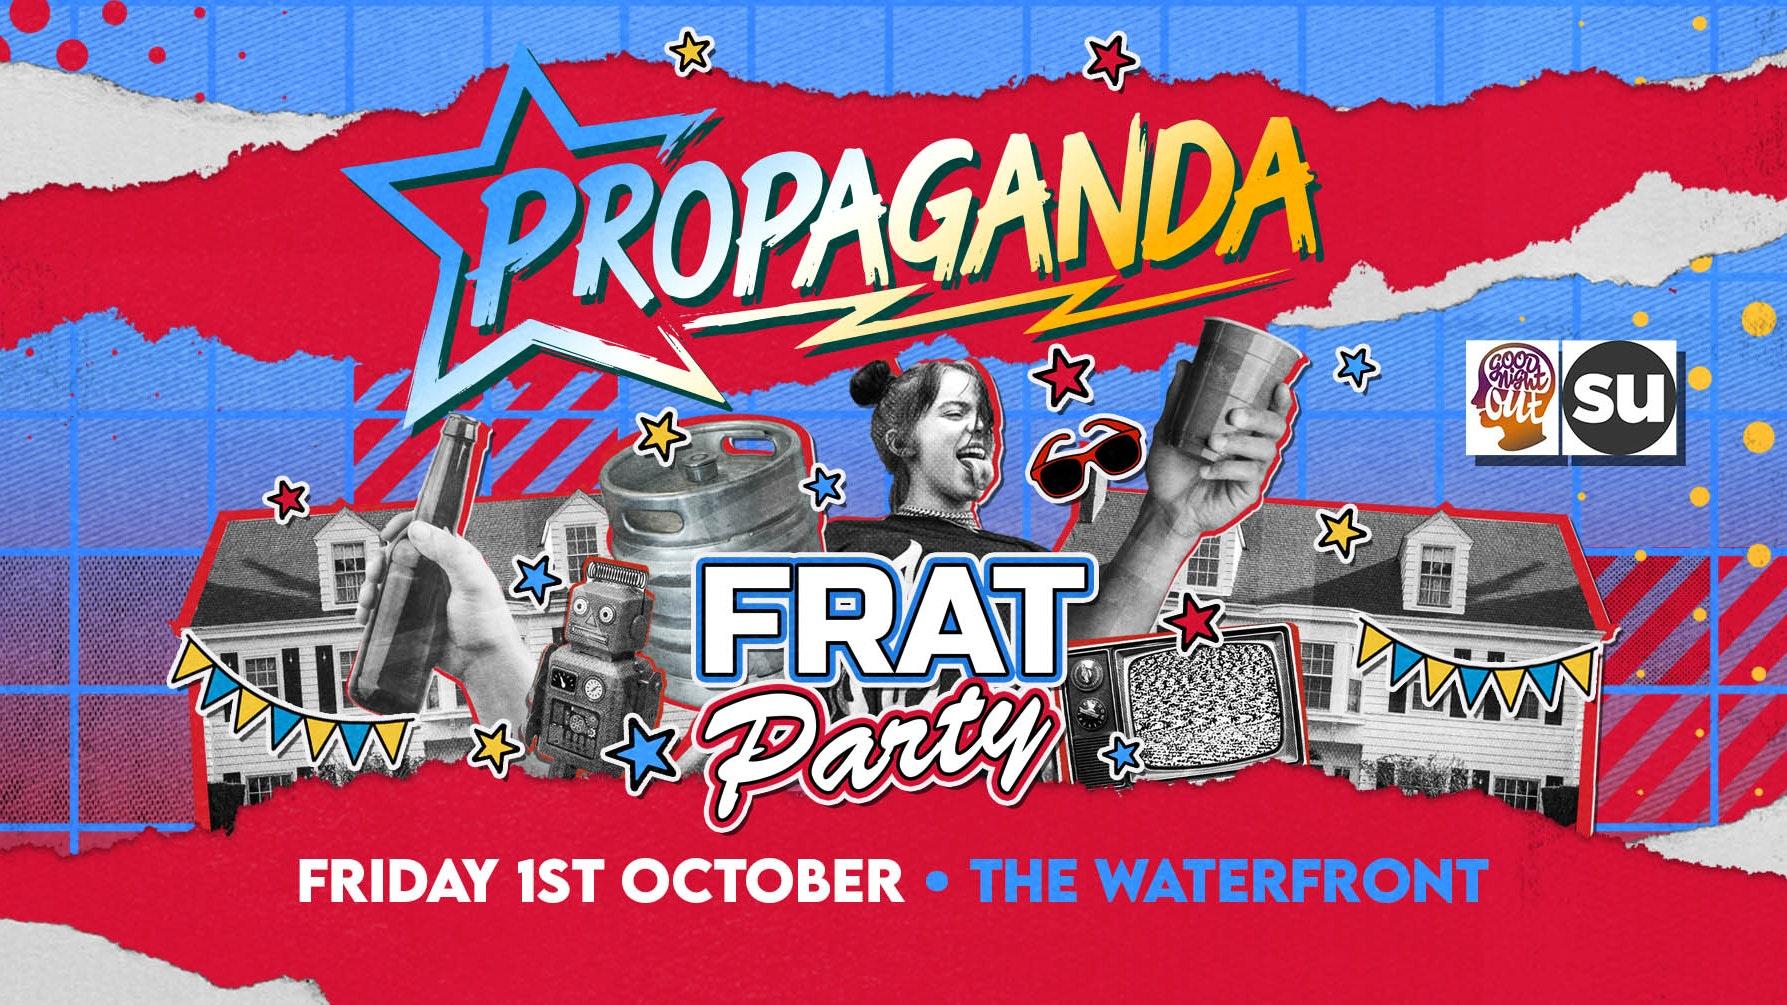 Propaganda Norwich – Frat Party!